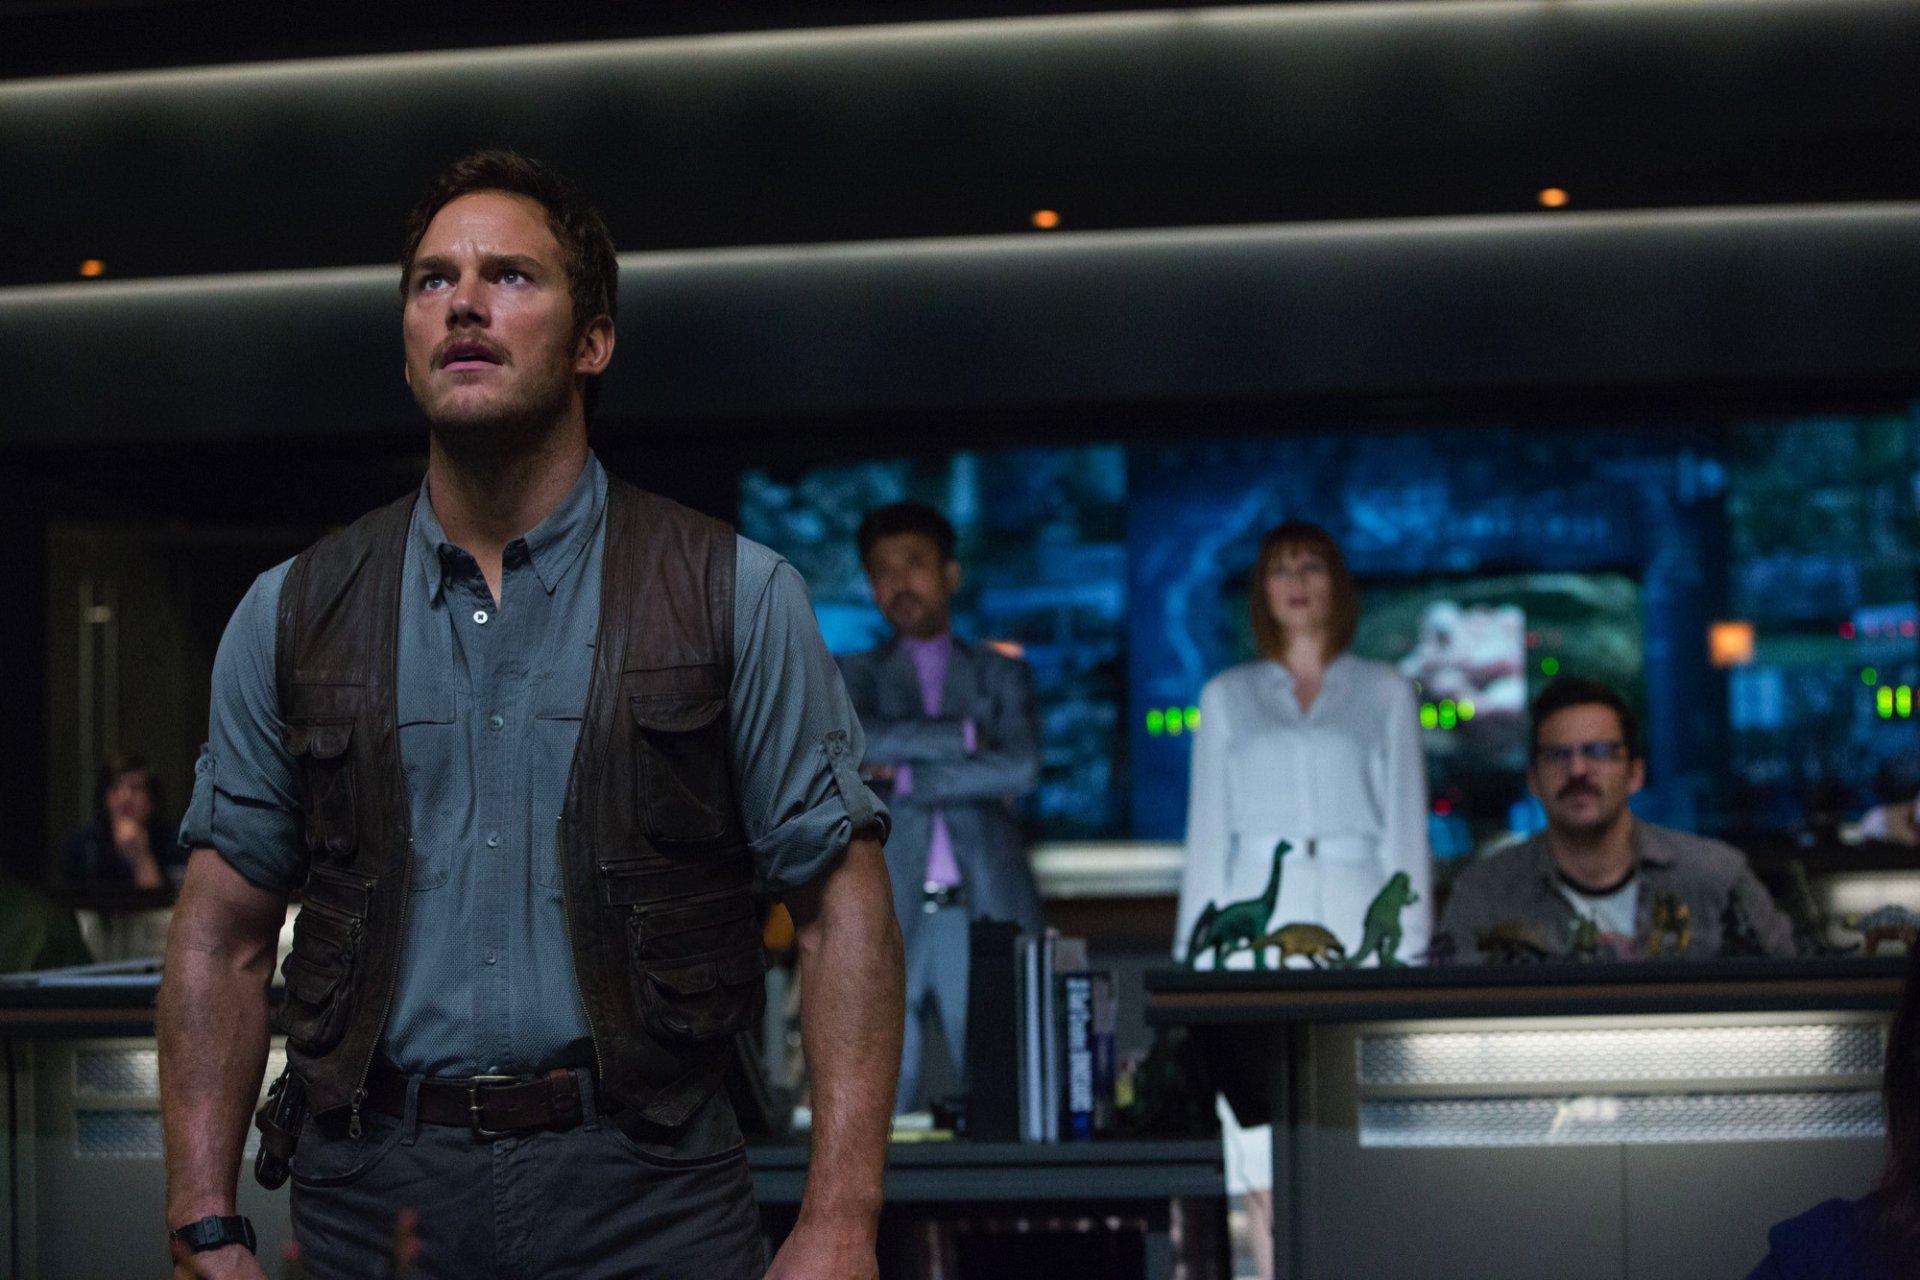 Movie - Jurassic World  Chris Pratt Wallpaper